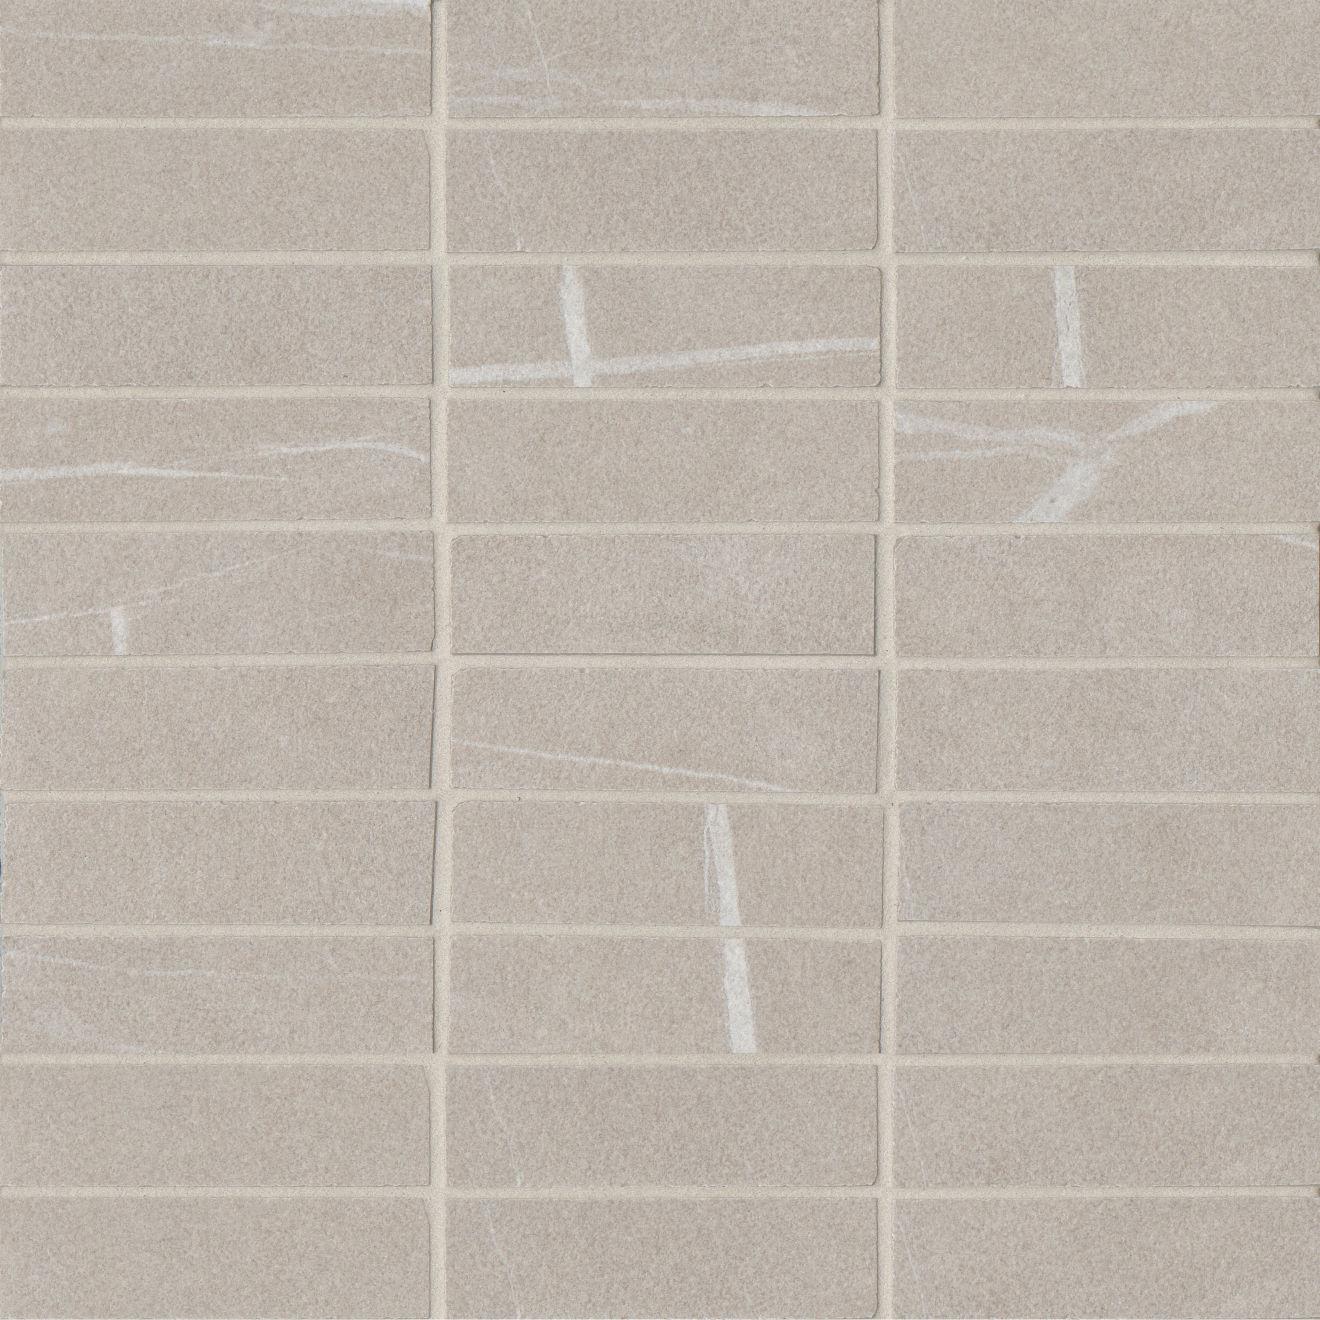 "Nomade 1""x4"" Matte Porcelain Straight Set Mosaic Tile in Bone"